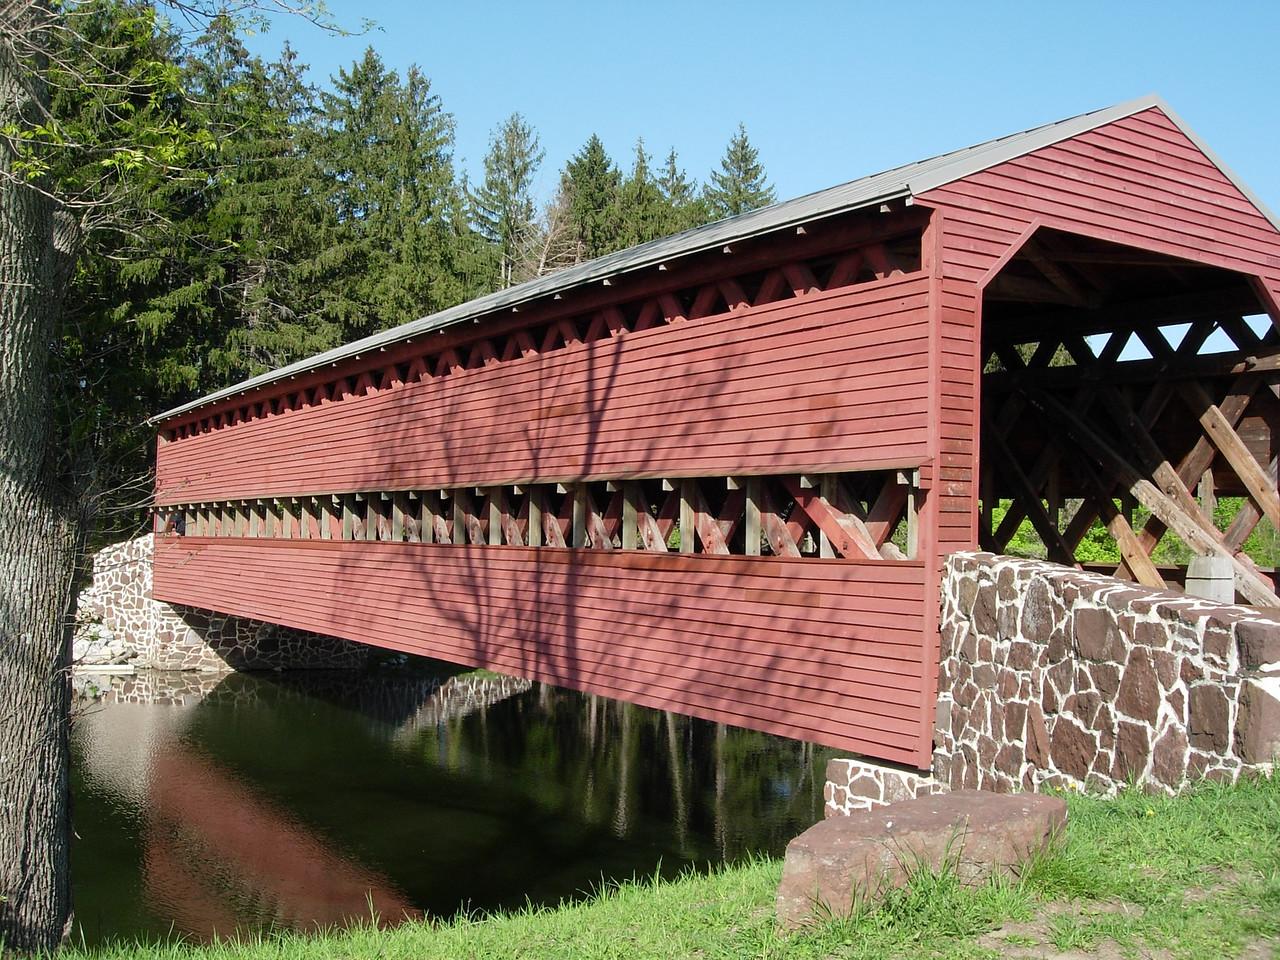 Sachs Bridge in Gettysburg